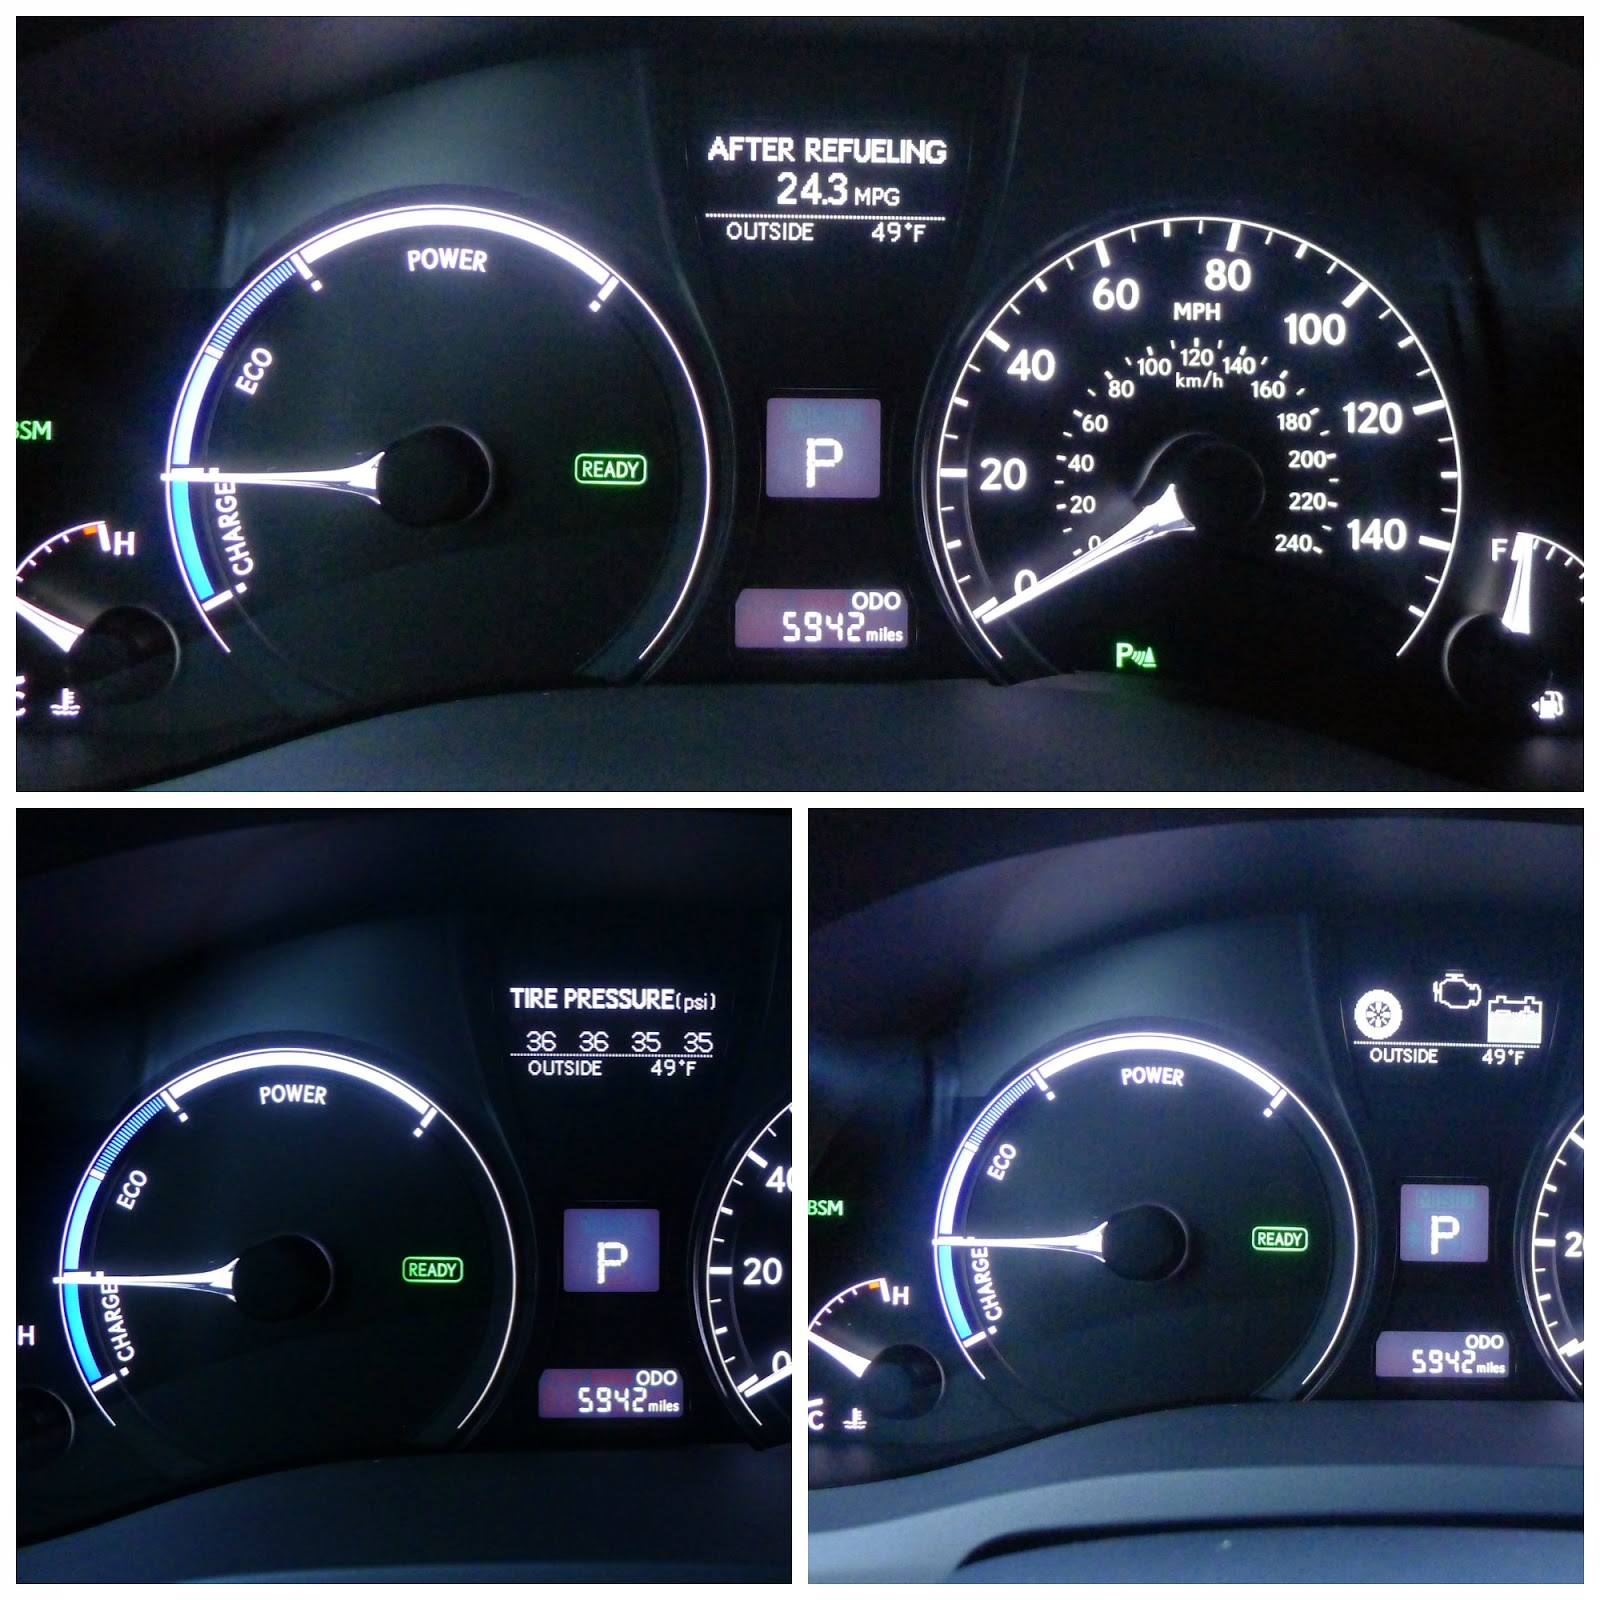 Lexus%2BRX%2B450h%2B1.jpg